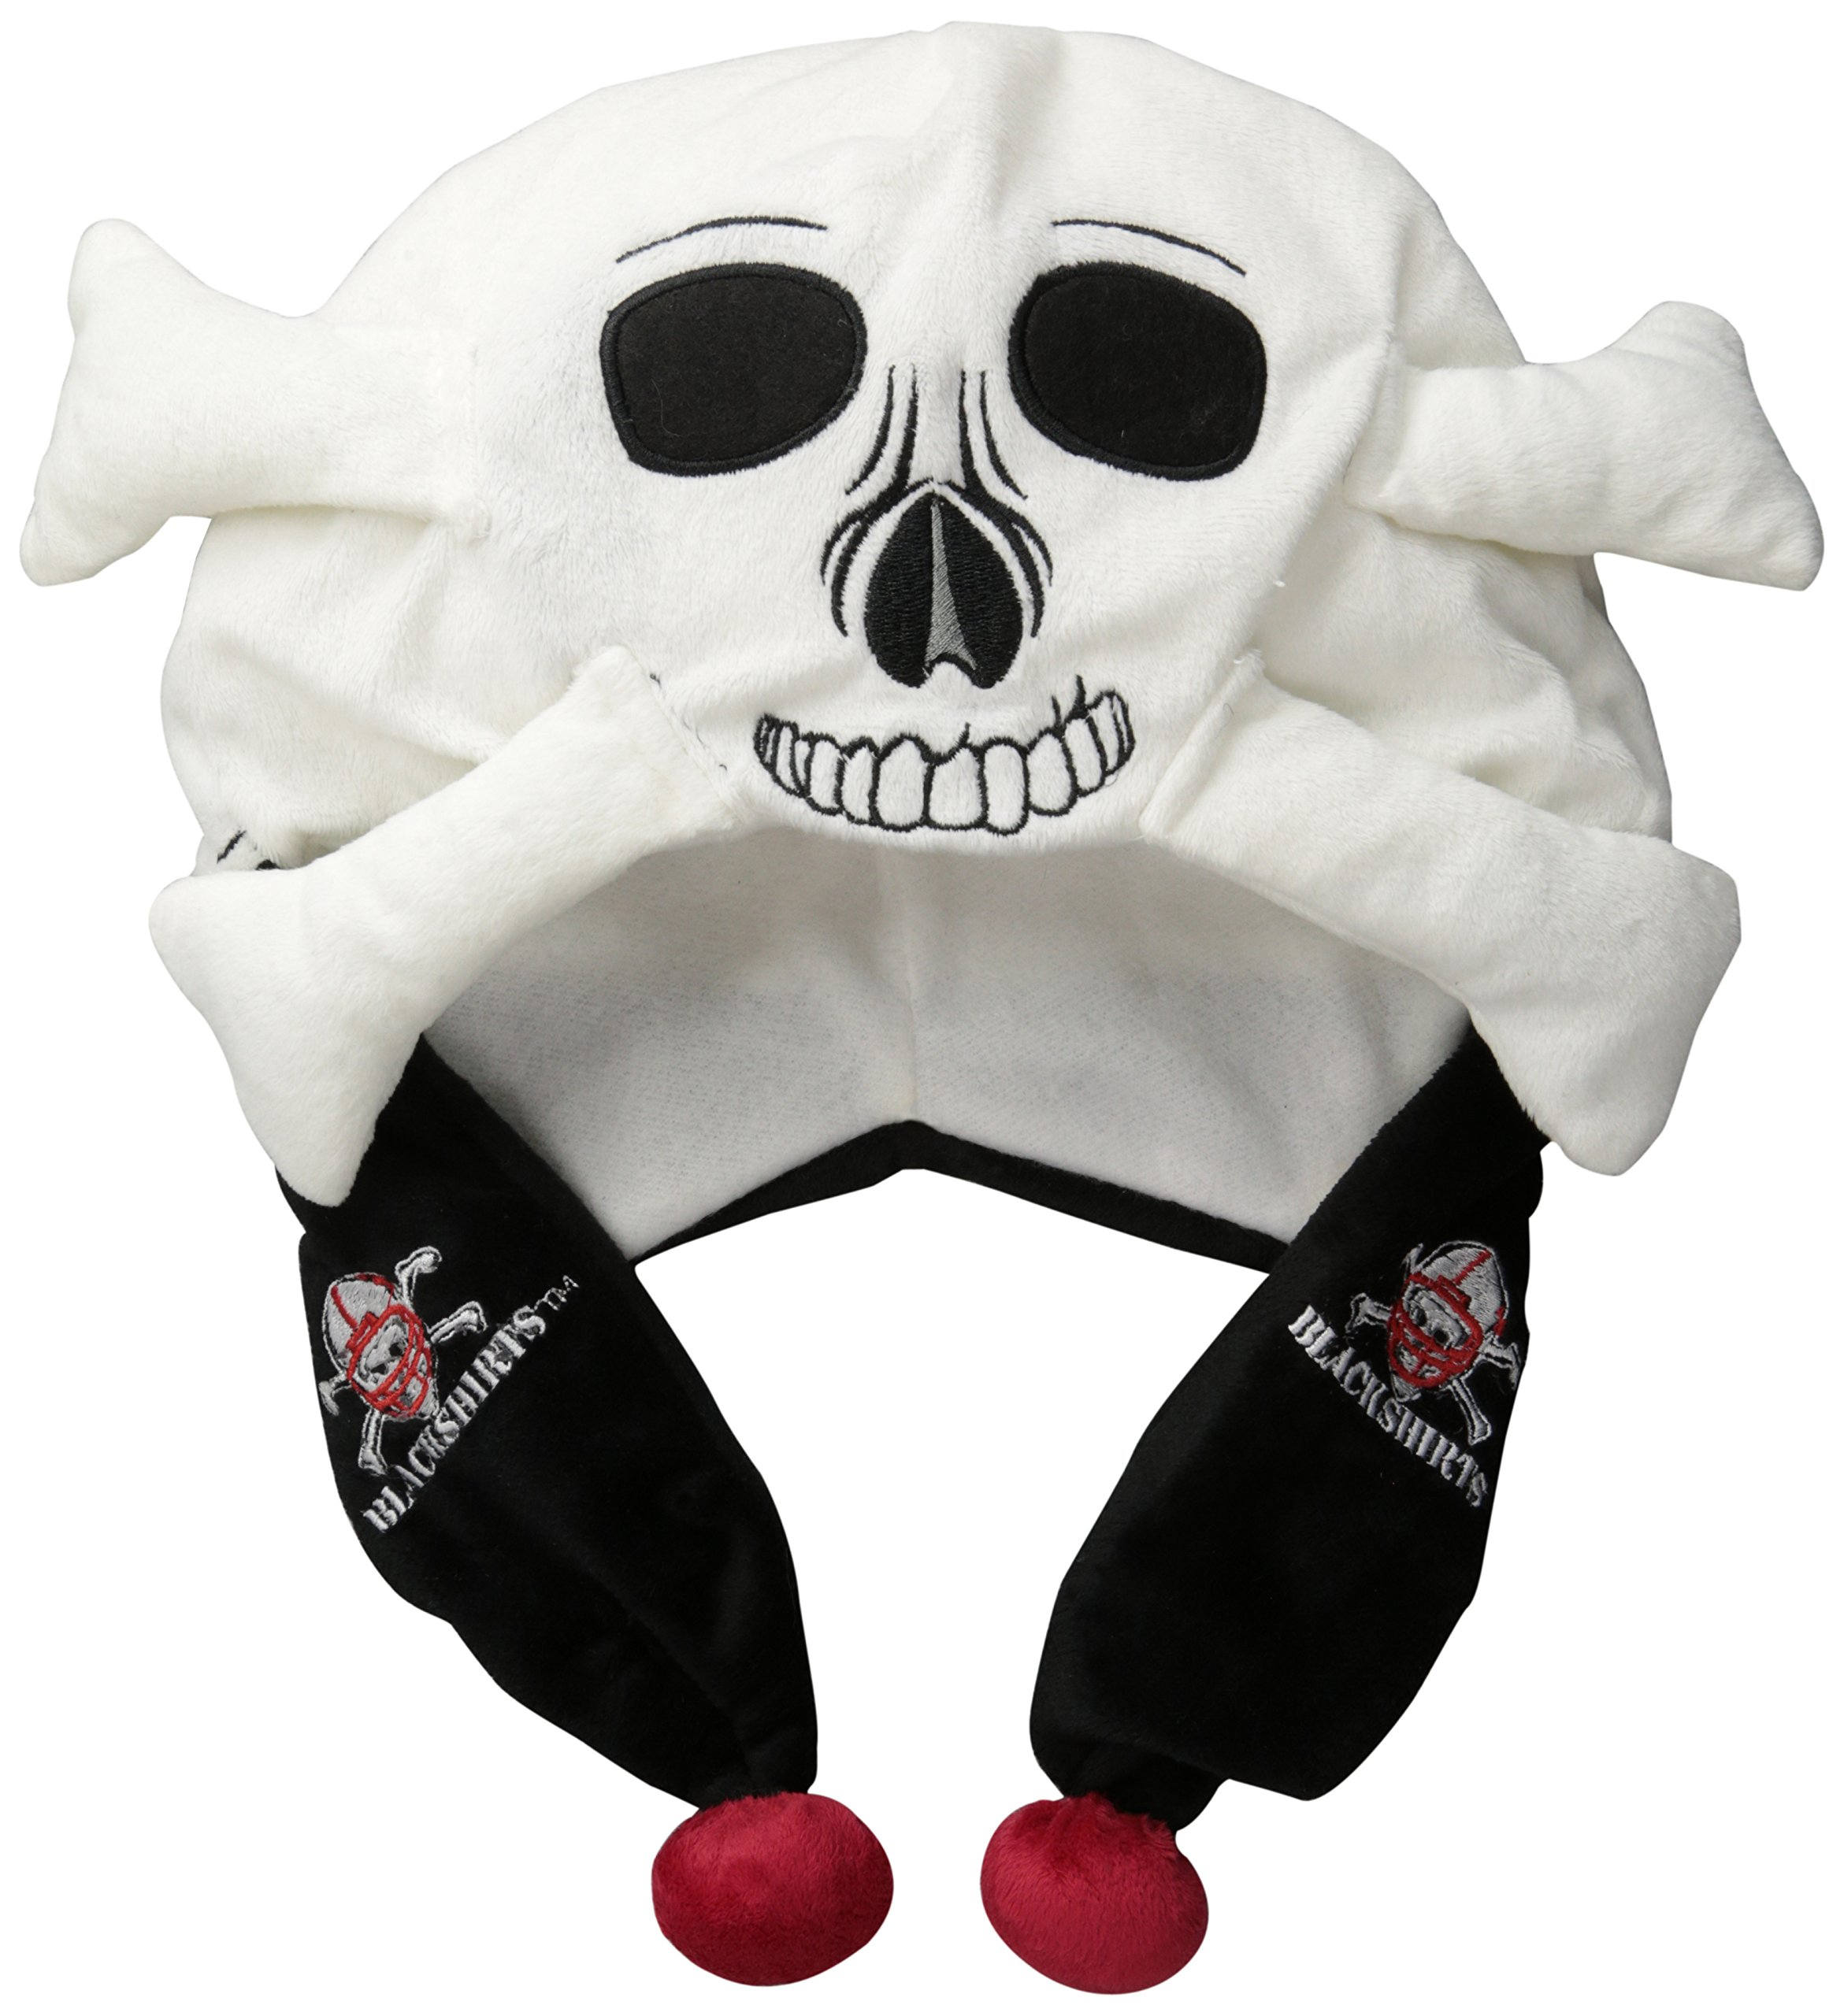 FOCO NCAA Nebraska Cornhuskers 2012 Mascot Blackshirts Short Thematic Hat